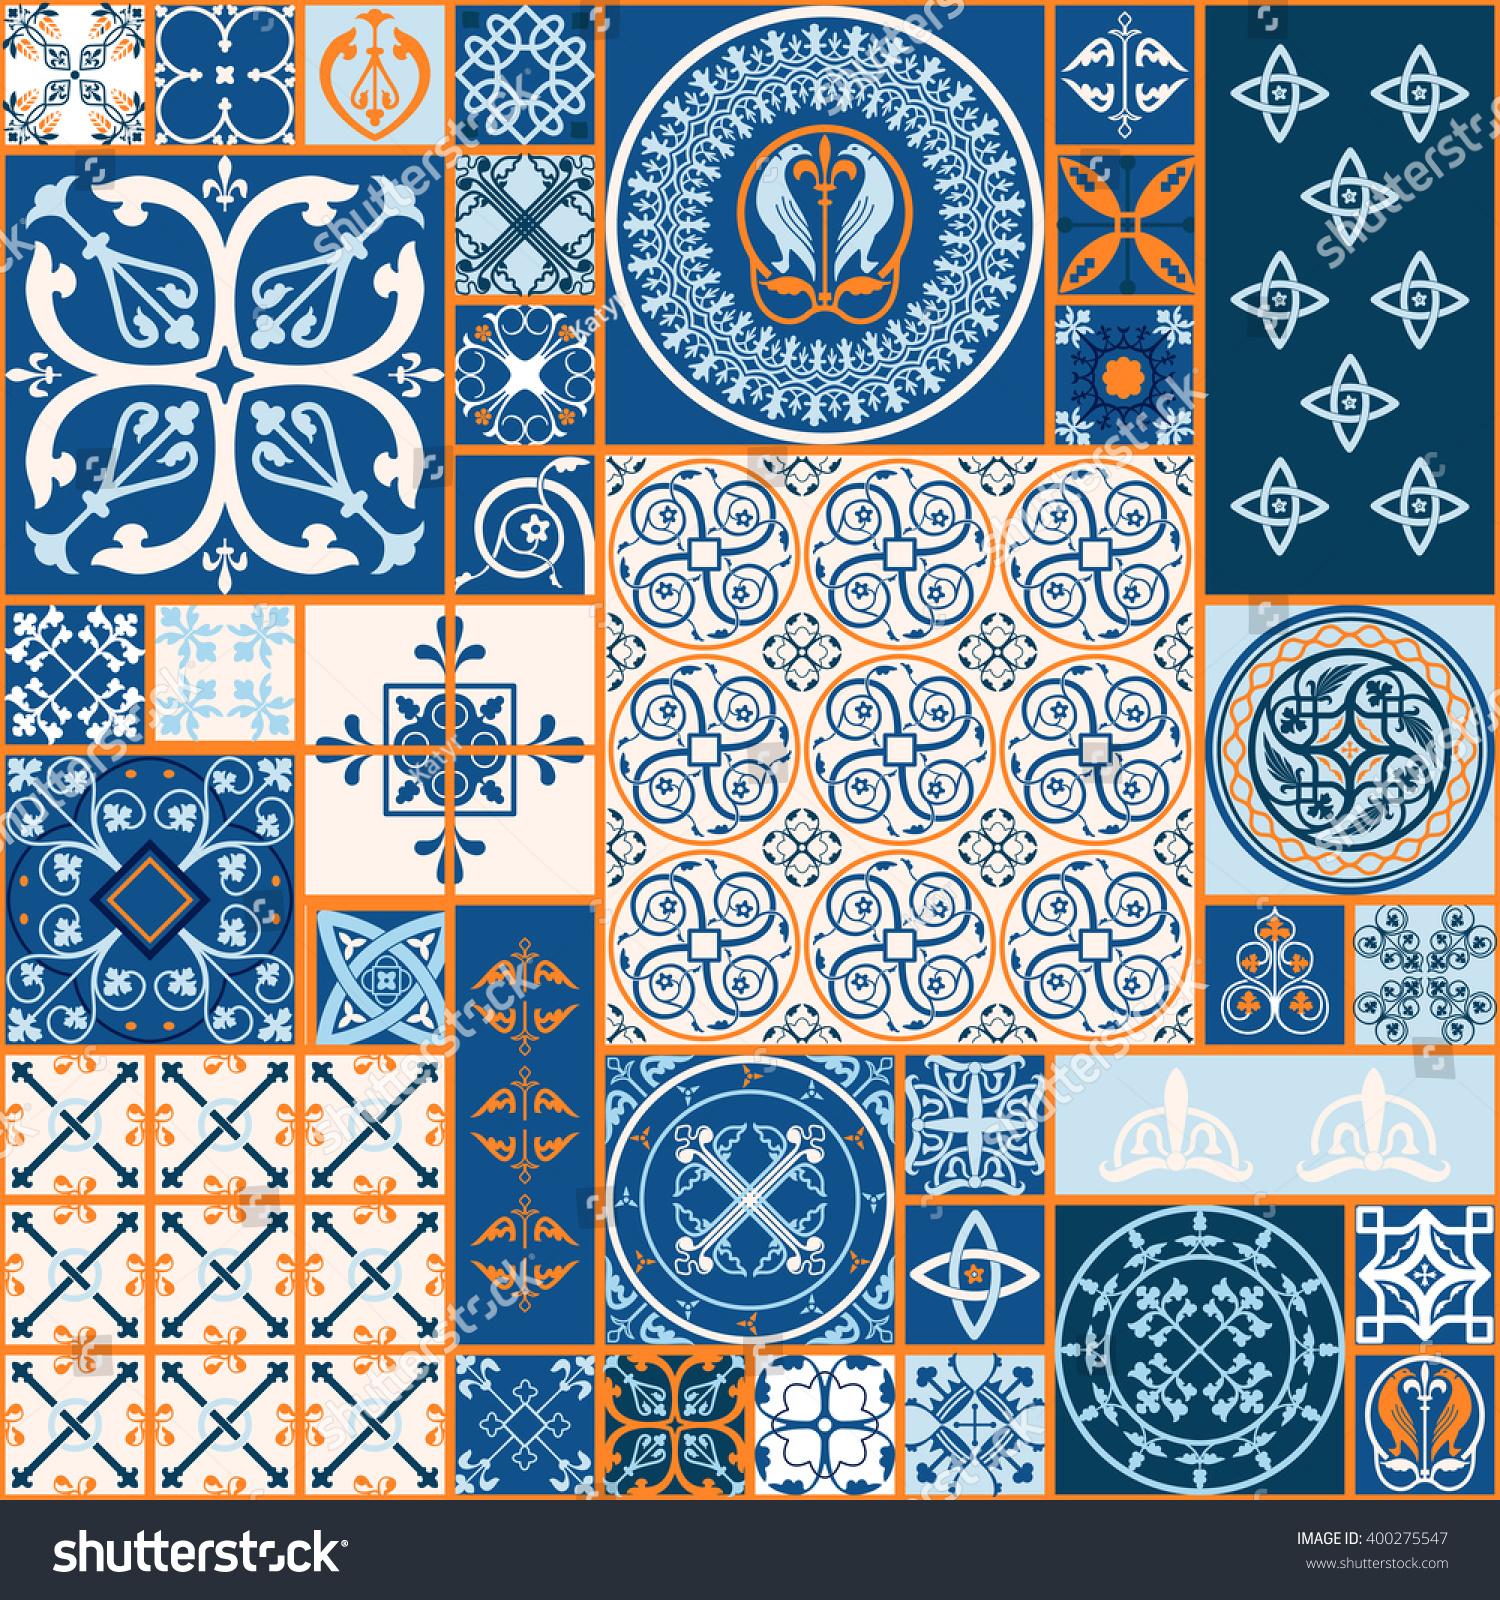 Vector of moroccan tile seamless pattern tile for design tile - Vector Tiles Moroccan Tiles Seamless Pattern Tile For Design Tile Background Spanish Tile